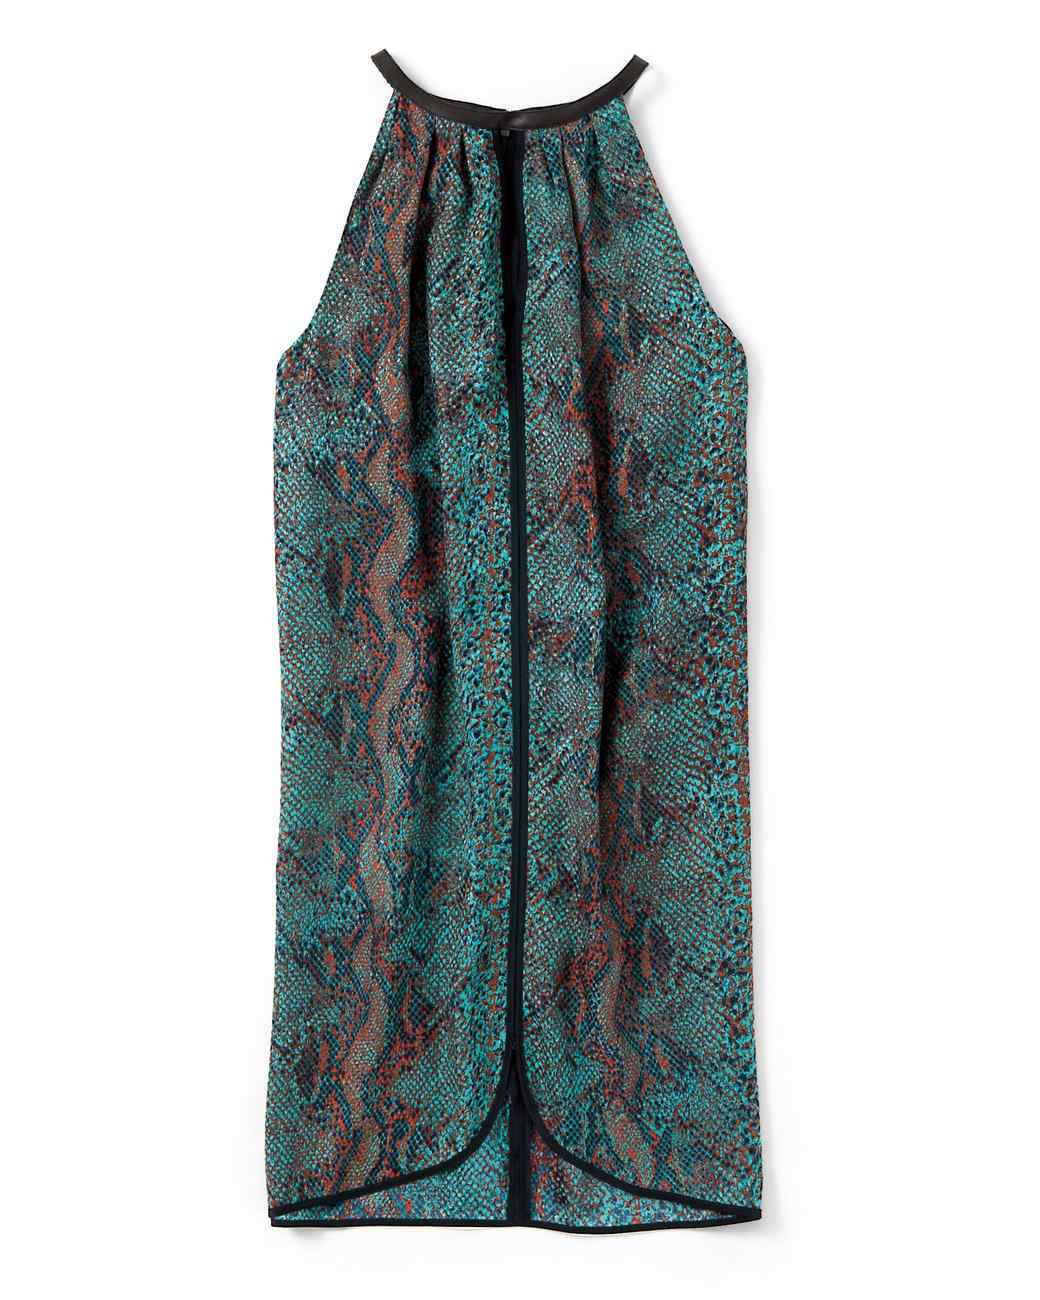 rebecca-taylor-dress-139-md109393.jpg